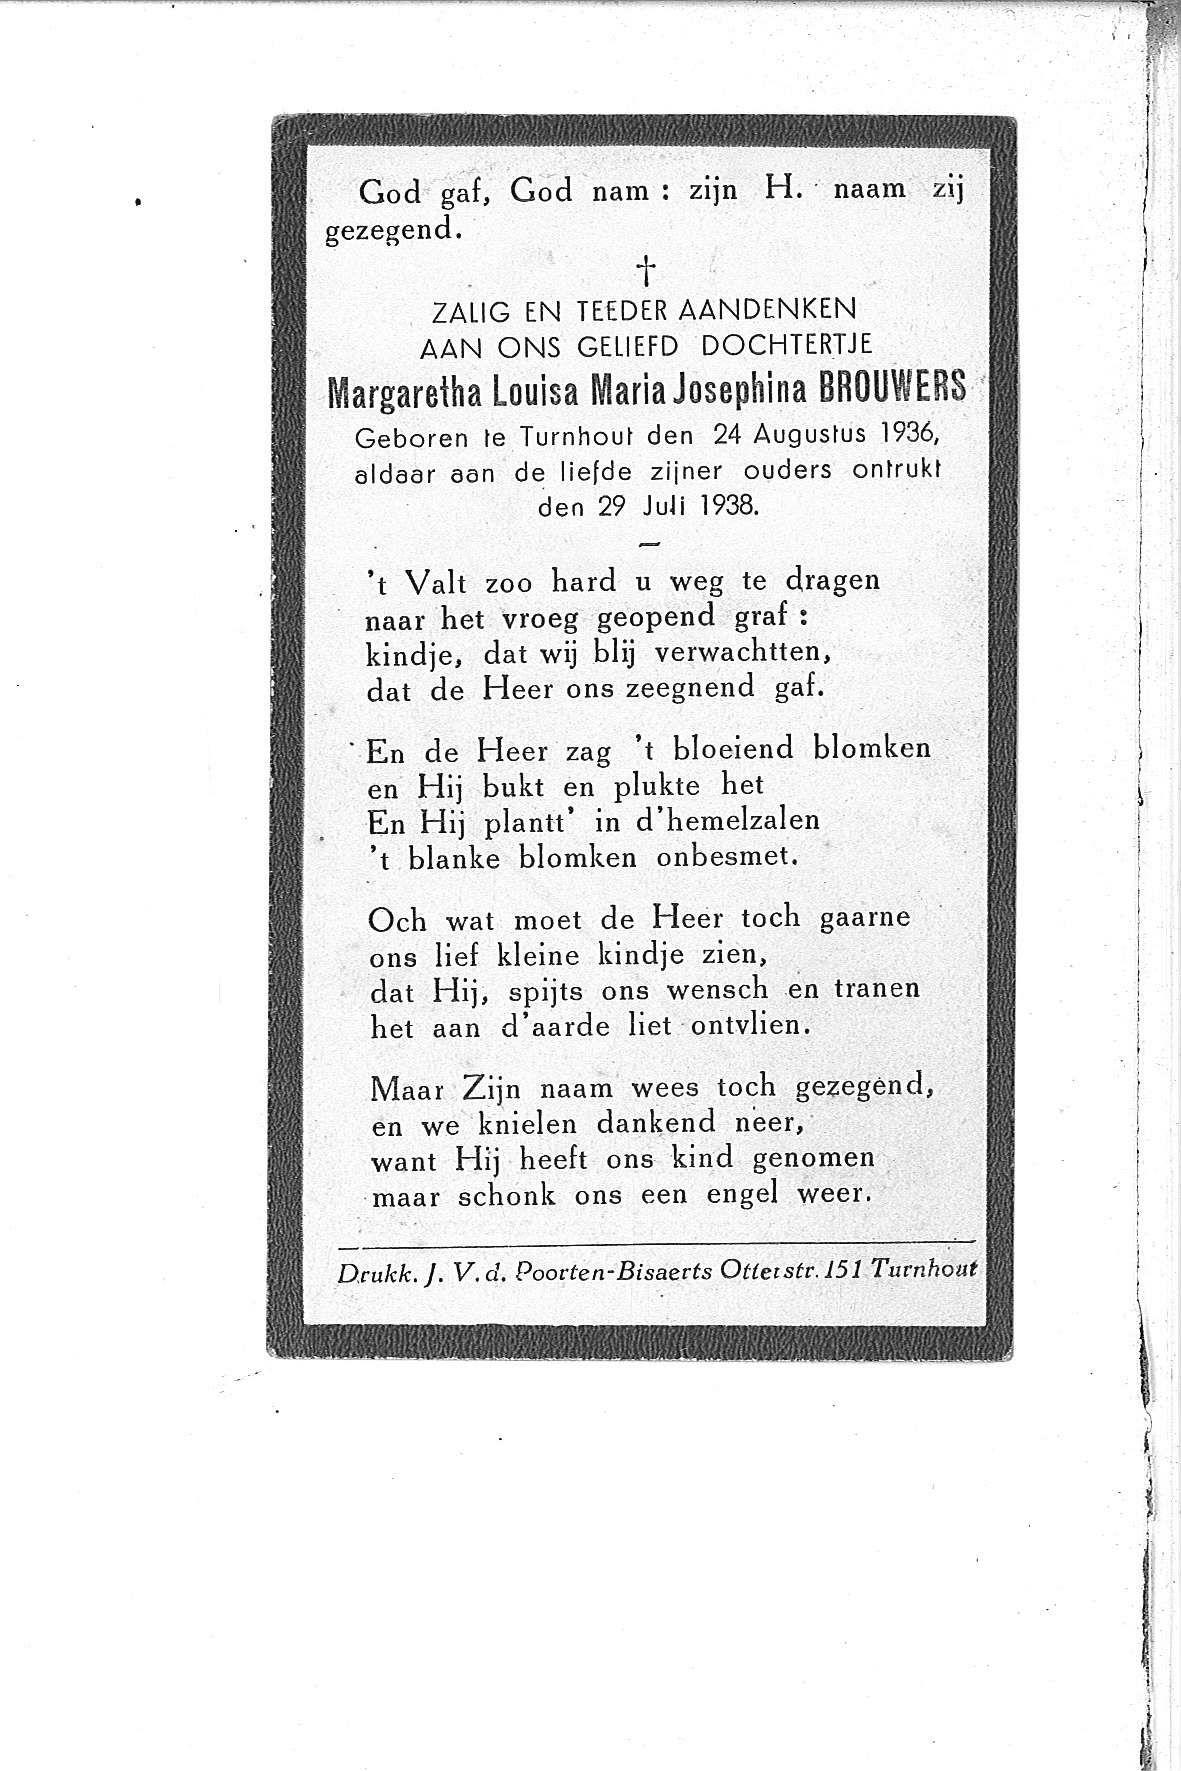 Margaretha Louisa Maria Josephina (1938) 20110805165022_00085.jpg